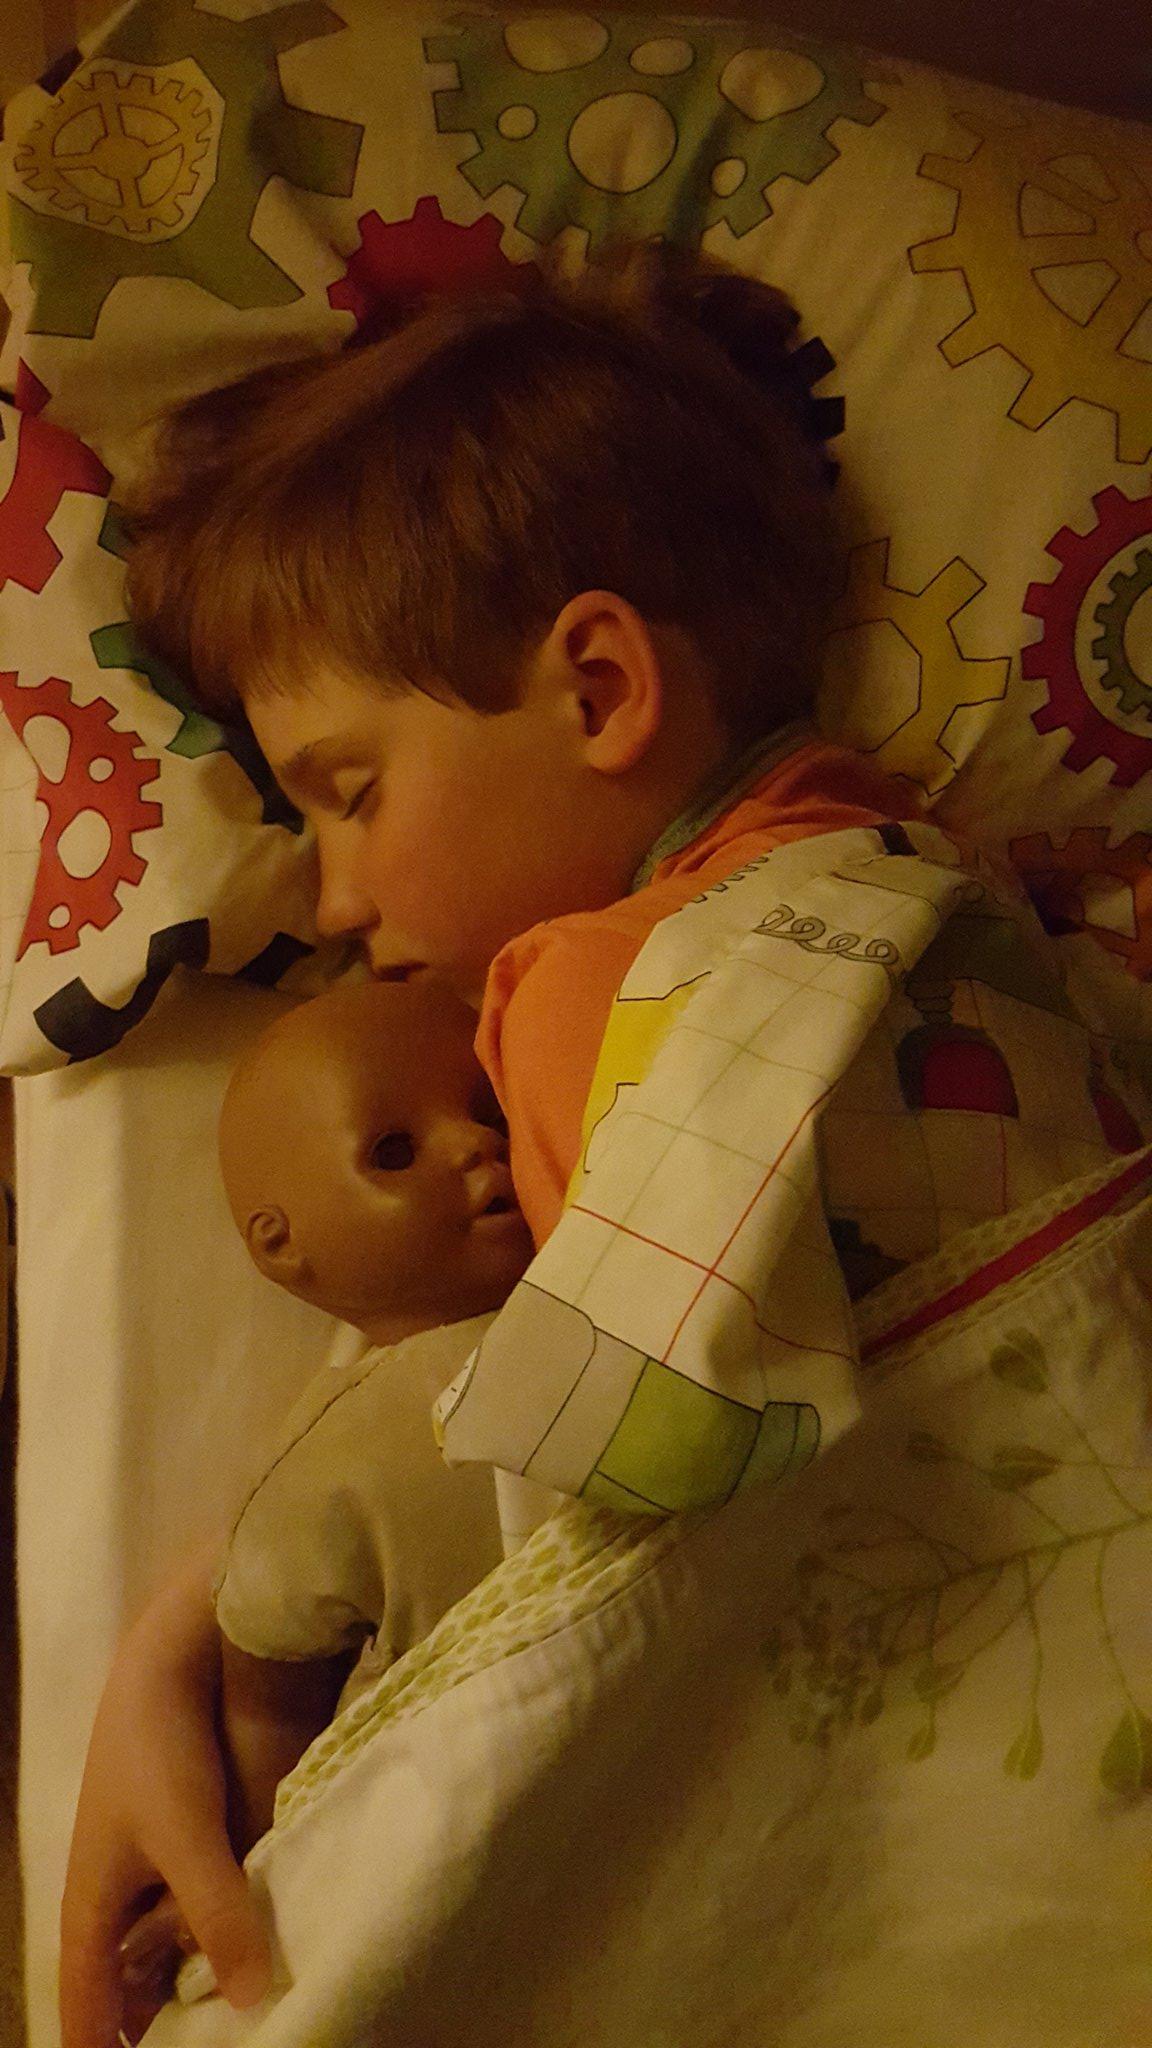 @LetToysBeToys @PigtailPals @ElizabethVSweet @Play_Unlimited @ToyNewsOnline my boy (7) & Dolly. https://t.co/oWdwzMUnDW